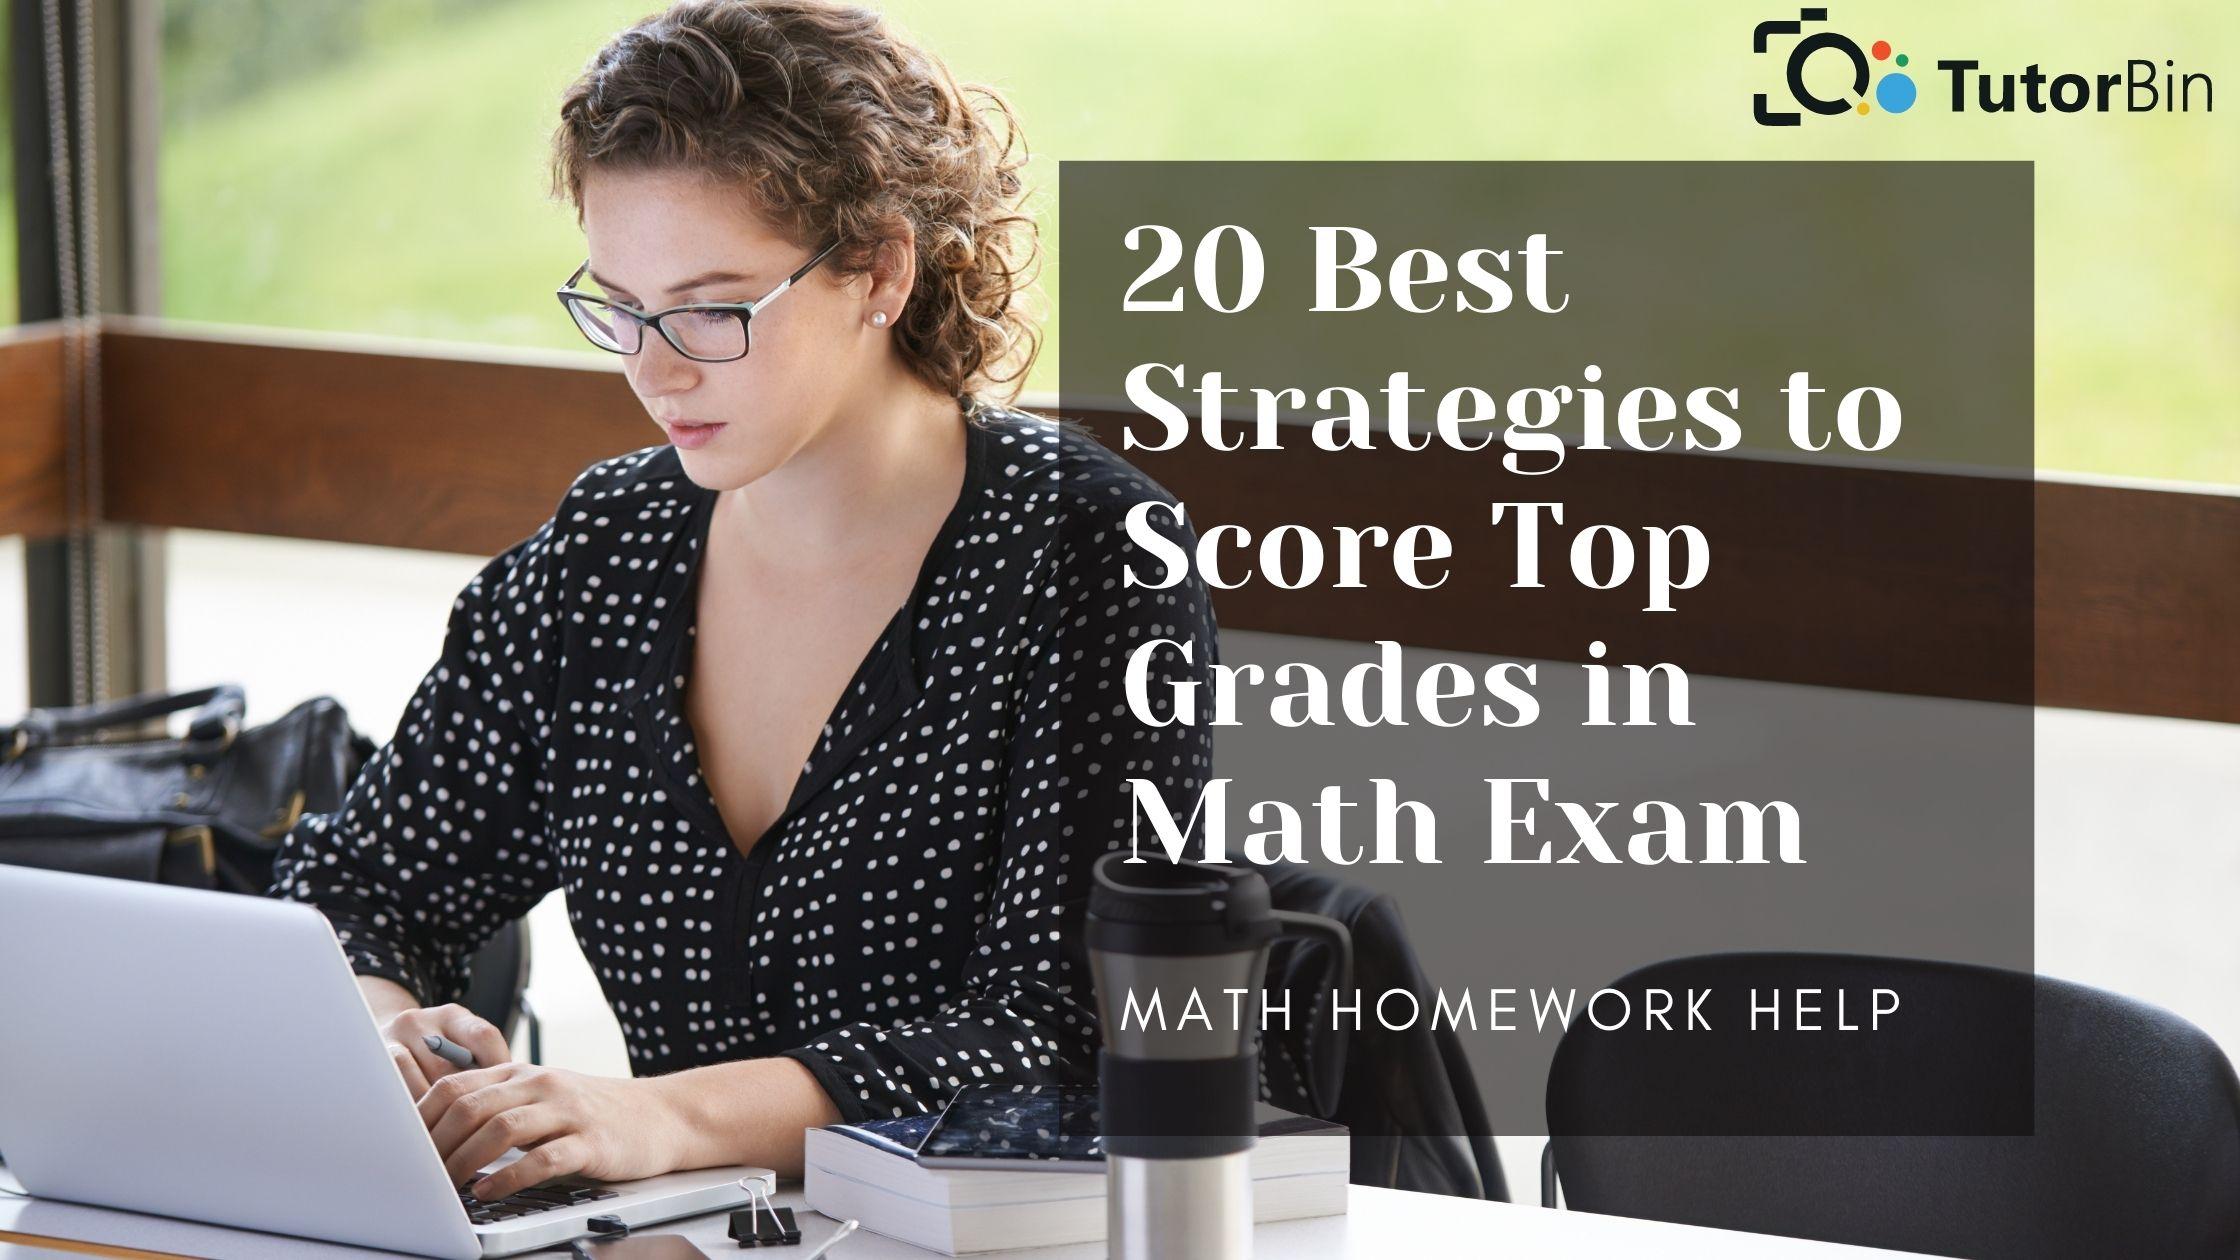 Math Homework Help: 20 Best Strategies to Score Top Grades in Math Exam